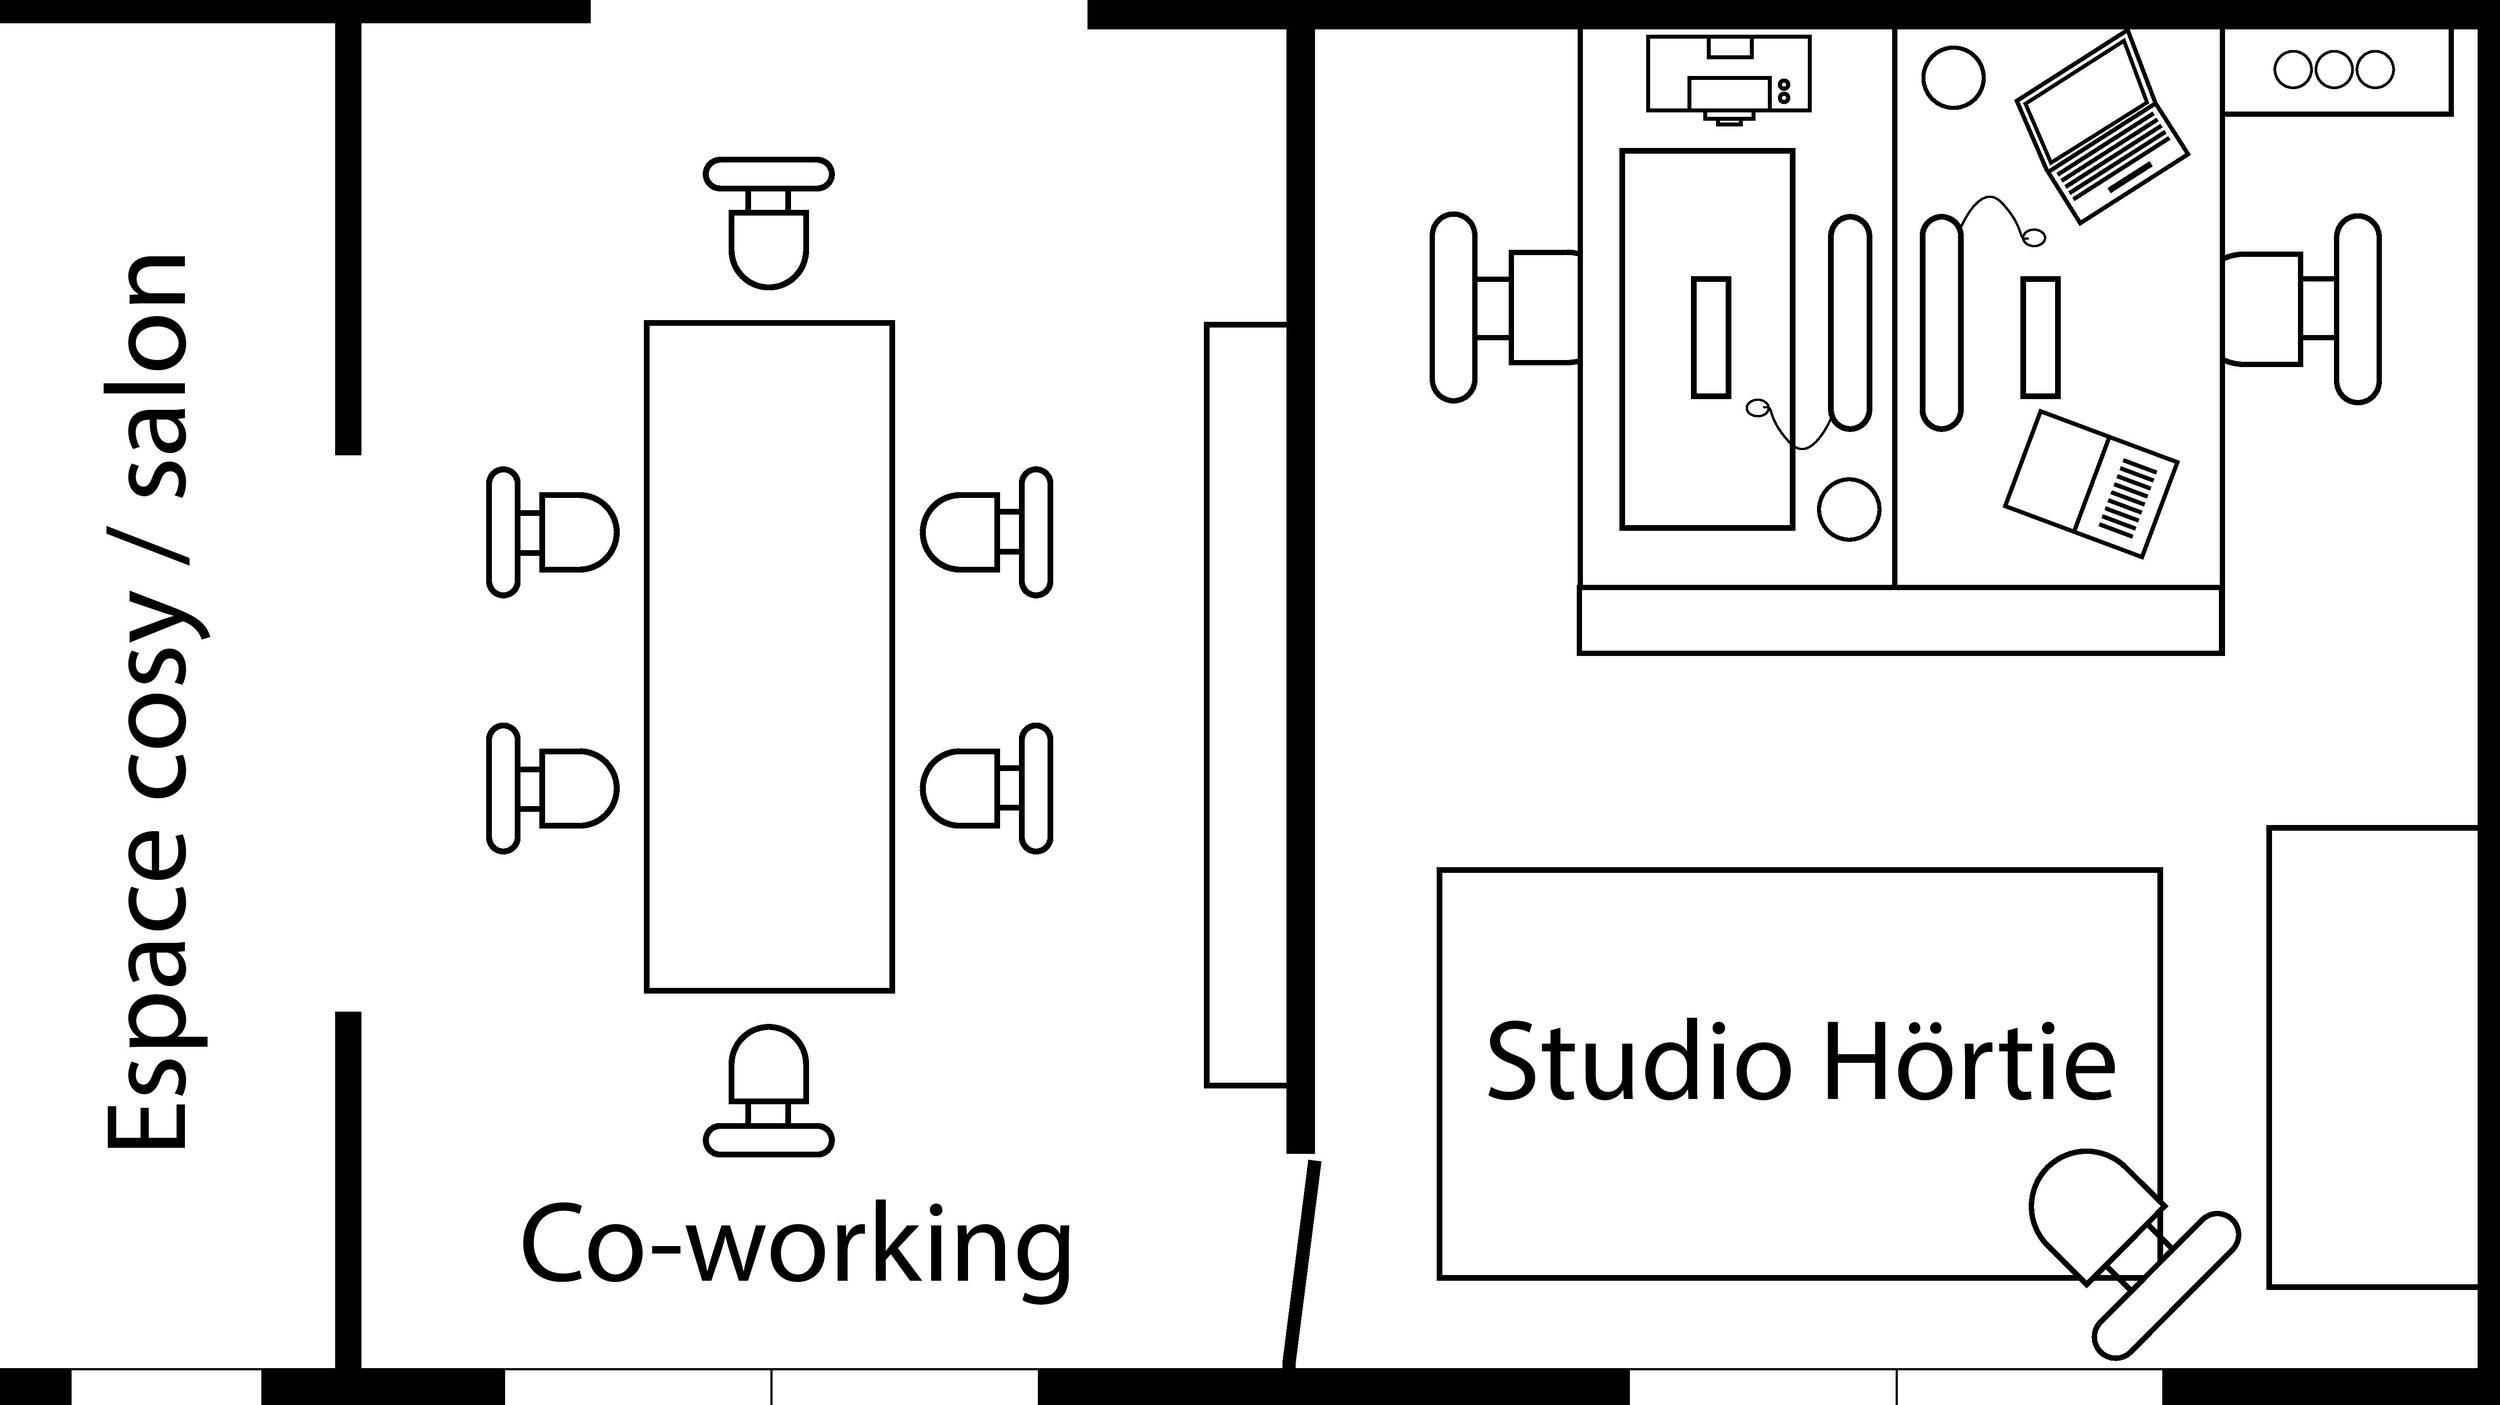 Studio Hörtie.jpg